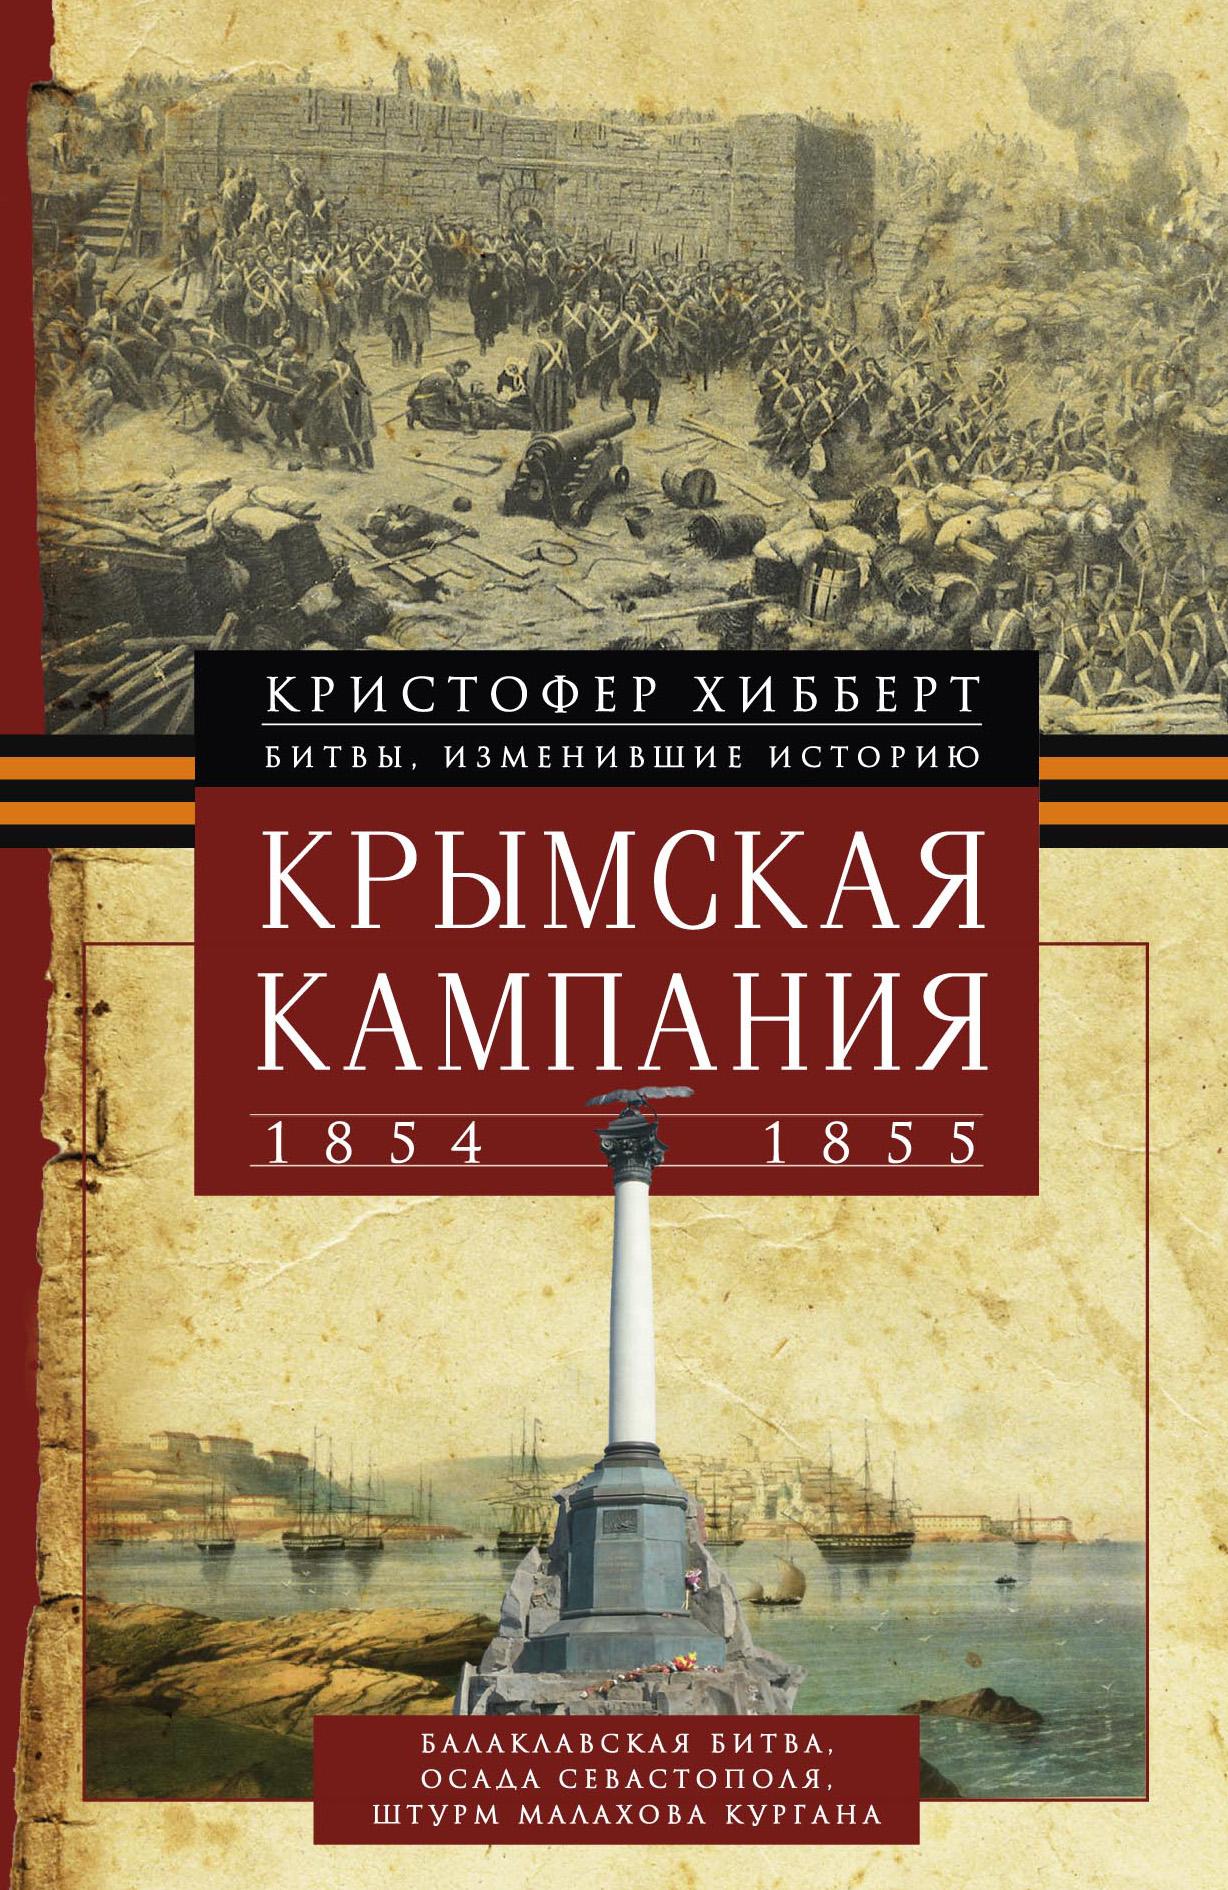 Крымская кампания 1854 – 1855 гг.